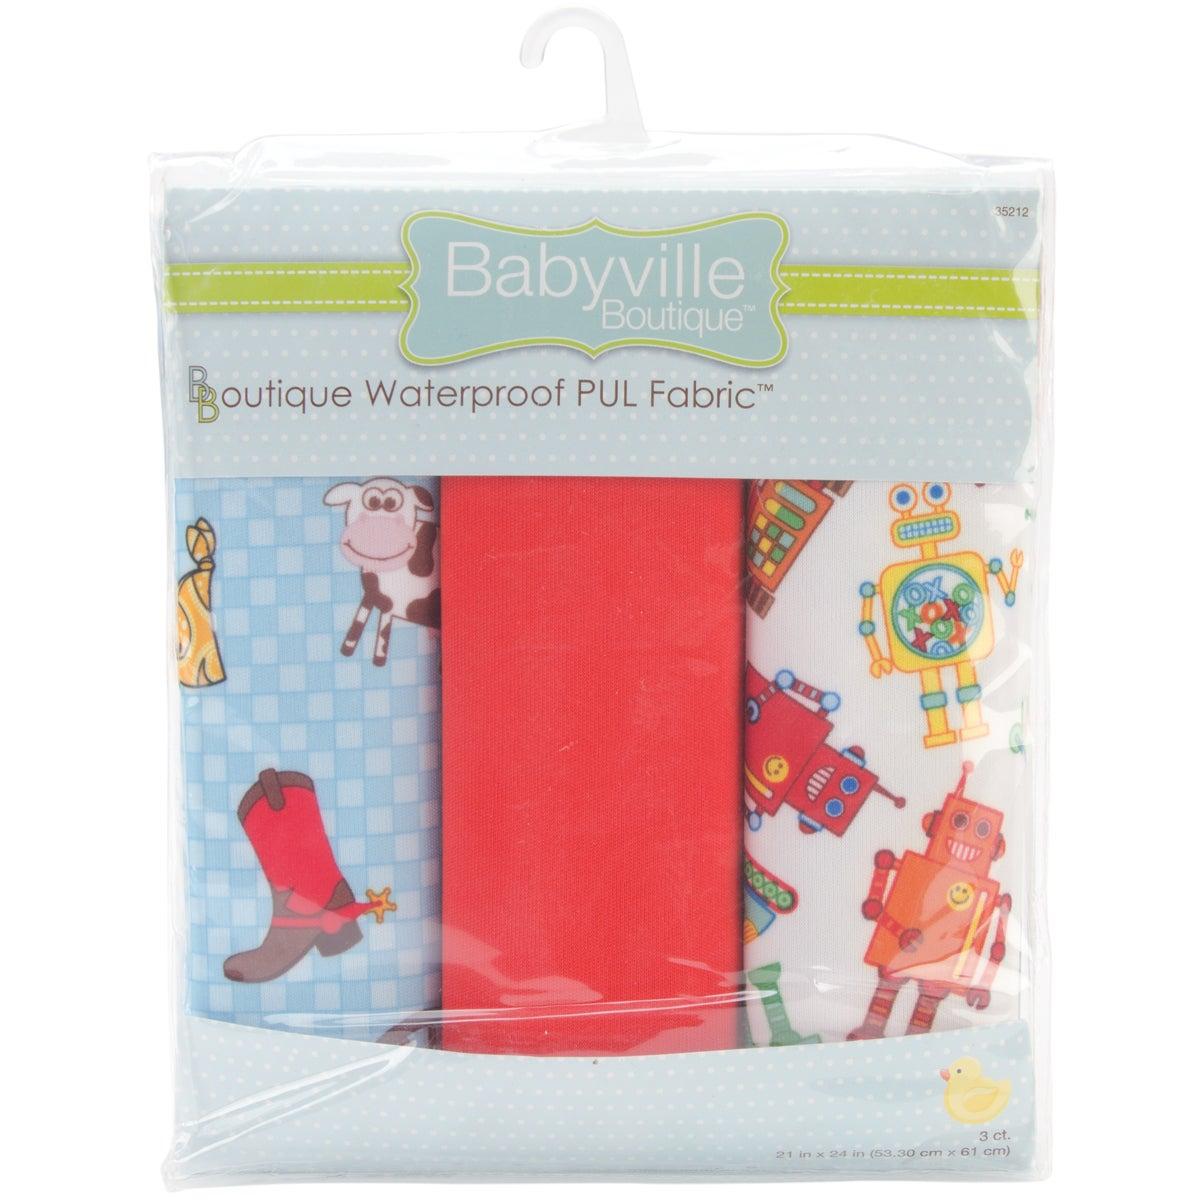 "Babyville Waterproof Diaper Fabric 21""x24"" Cuts 3/Pkg-PUL Cowbaby & Robots"